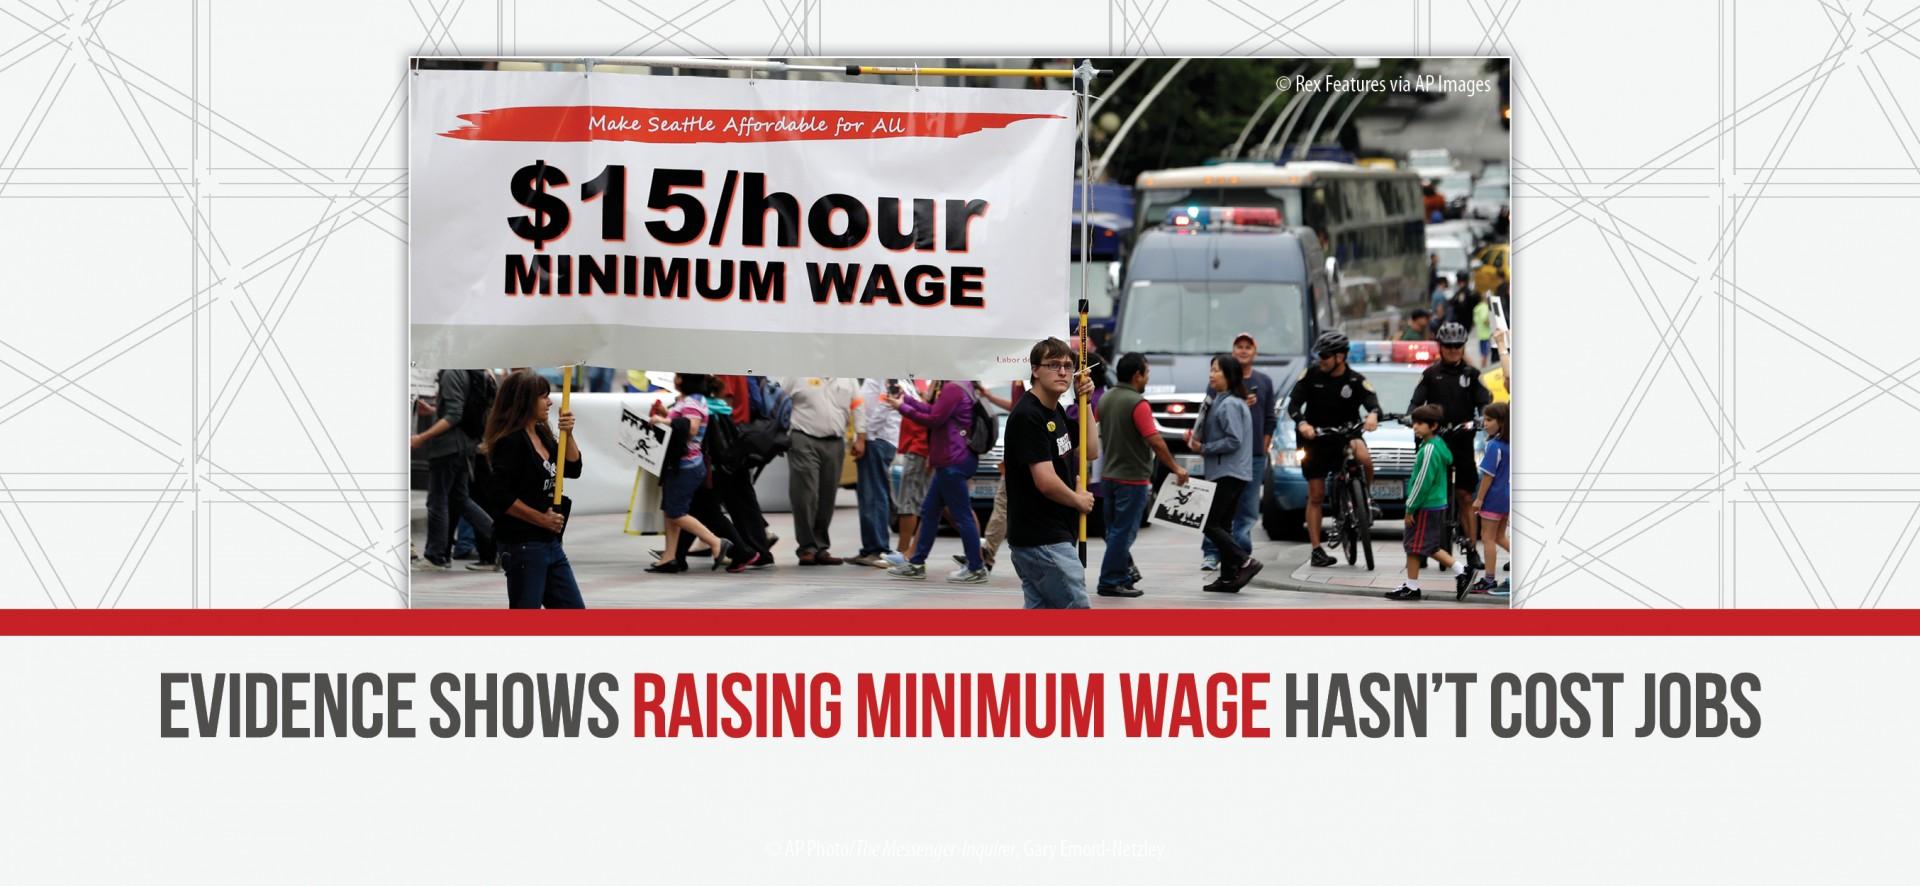 005 Essay On Minimum Wage Example 2014 Mar Apr Images5 Beautiful Argumentative Raising Persuasive Increase Free 1920